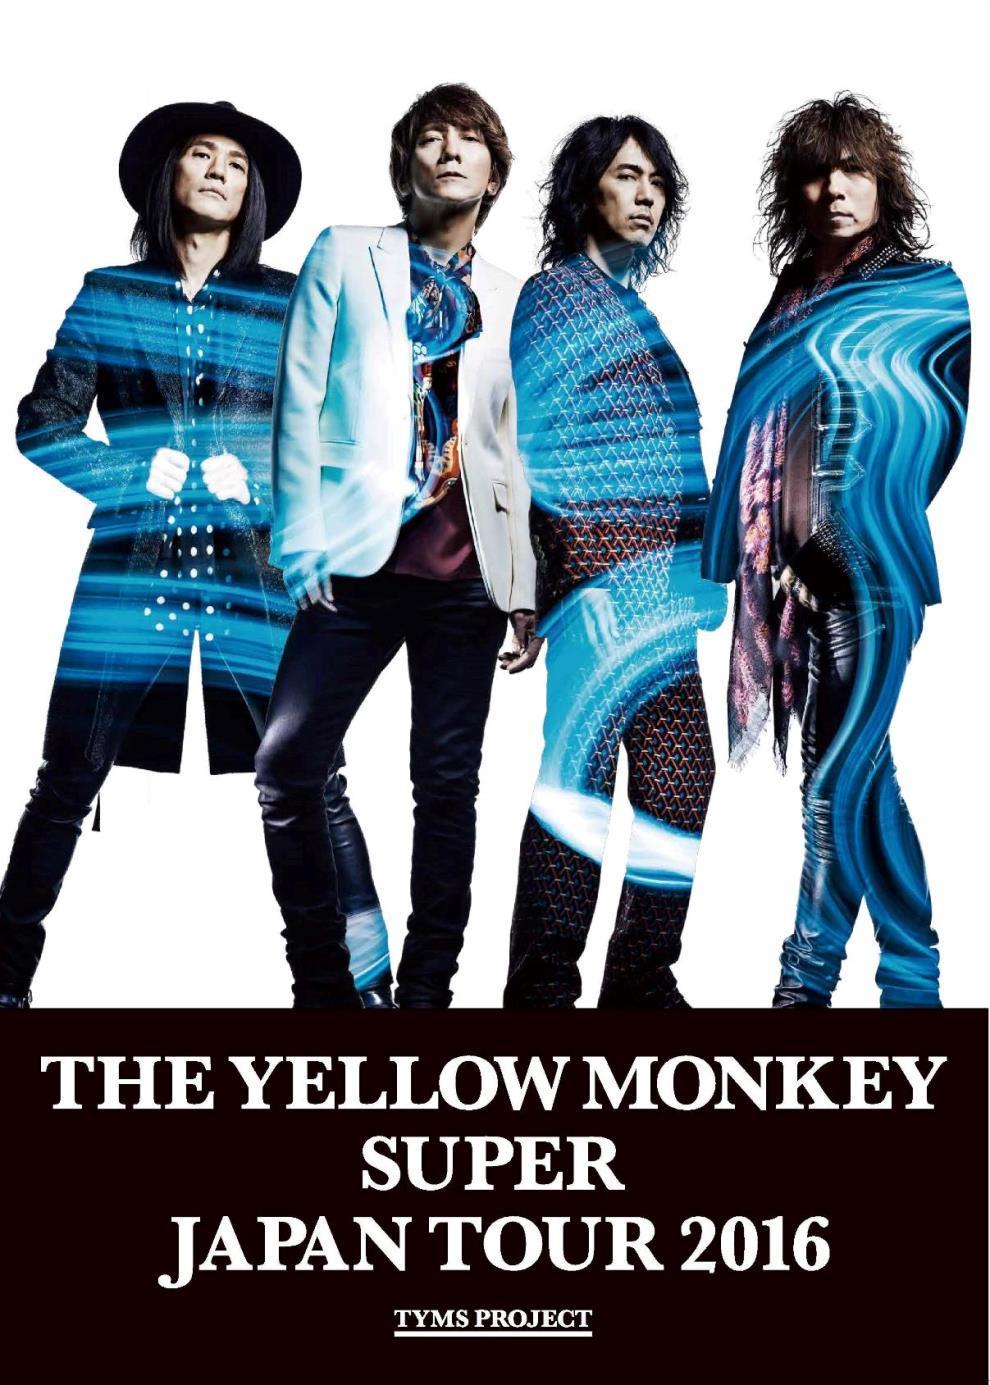 THE YELLOW MONKEY 特典ポスター